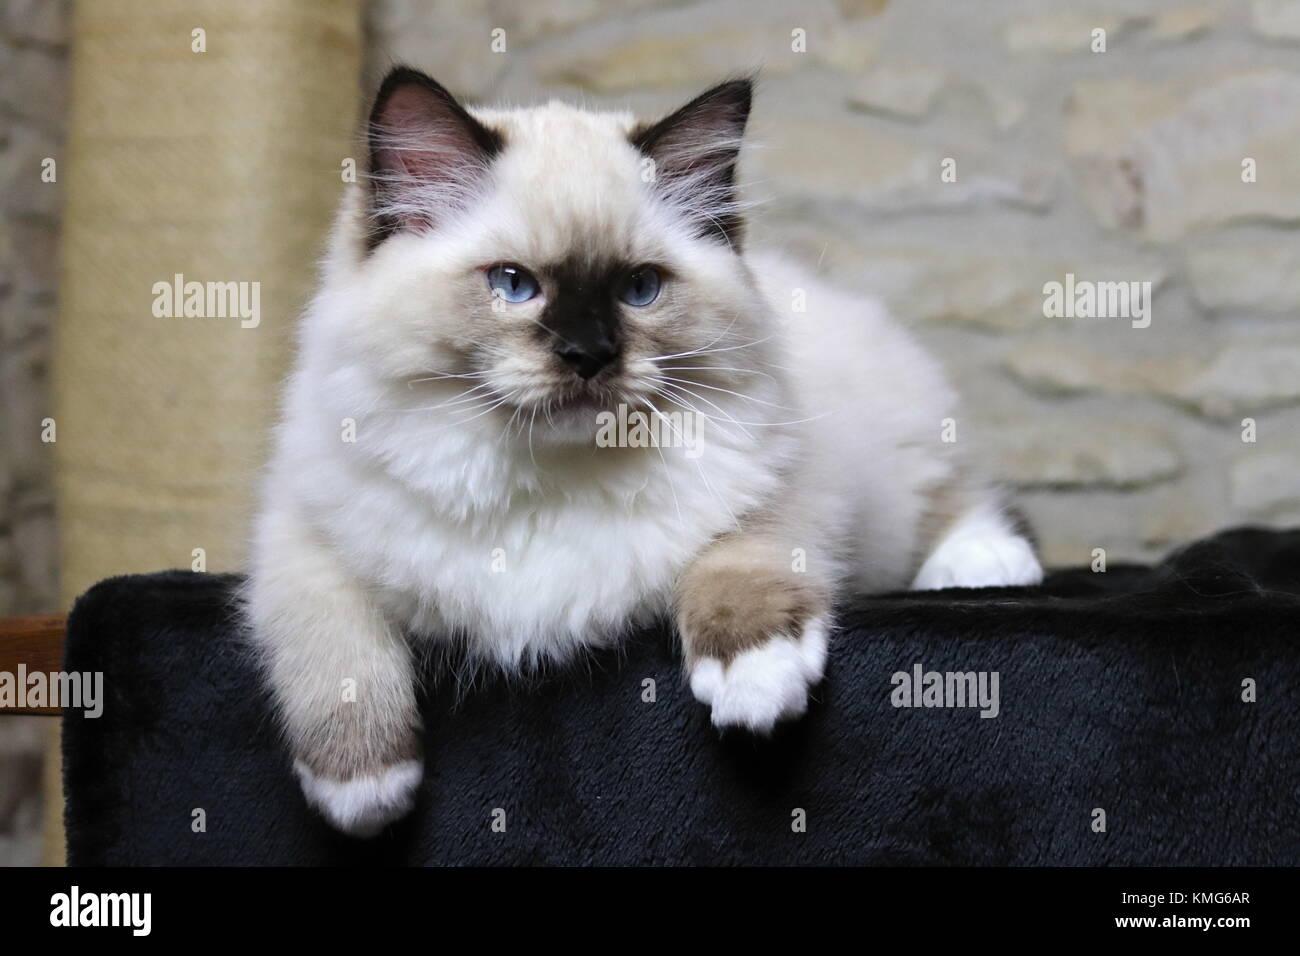 Ragdoll Kittens Cats Stock Photo Alamy